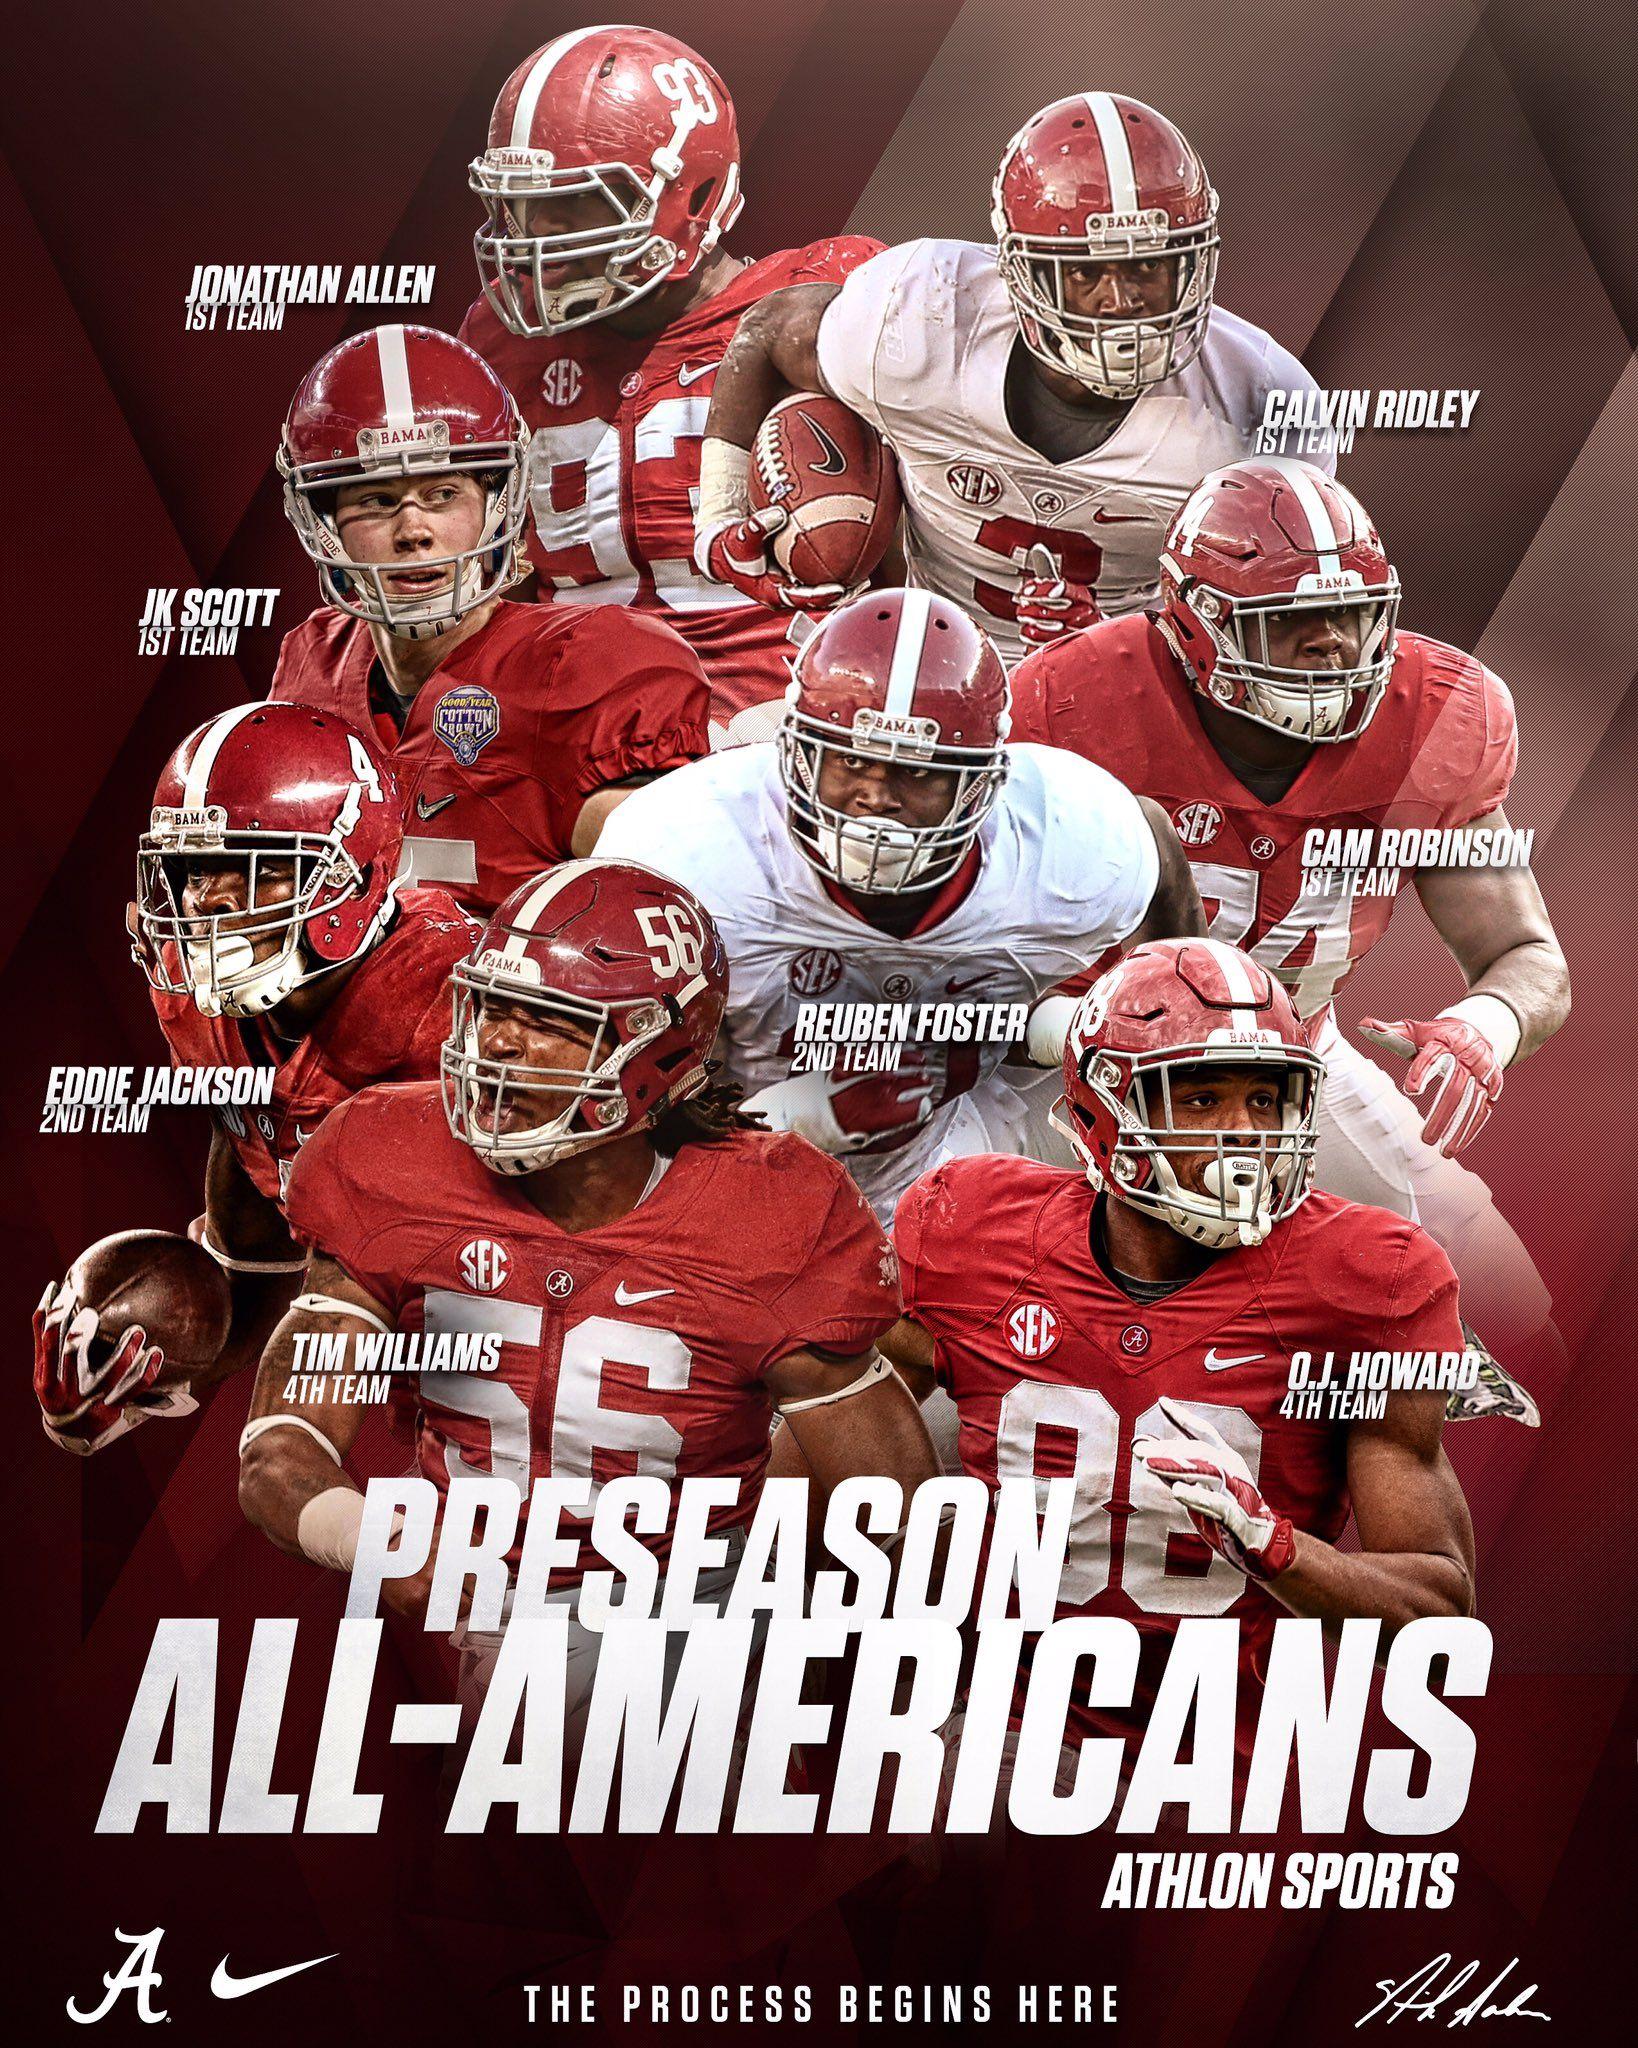 2016 Athlon Sports Preseason All American Alabama Crimson Tide Football 1st Team Jona Alabama Football Alabama Crimson Tide Football Crimson Tide Football